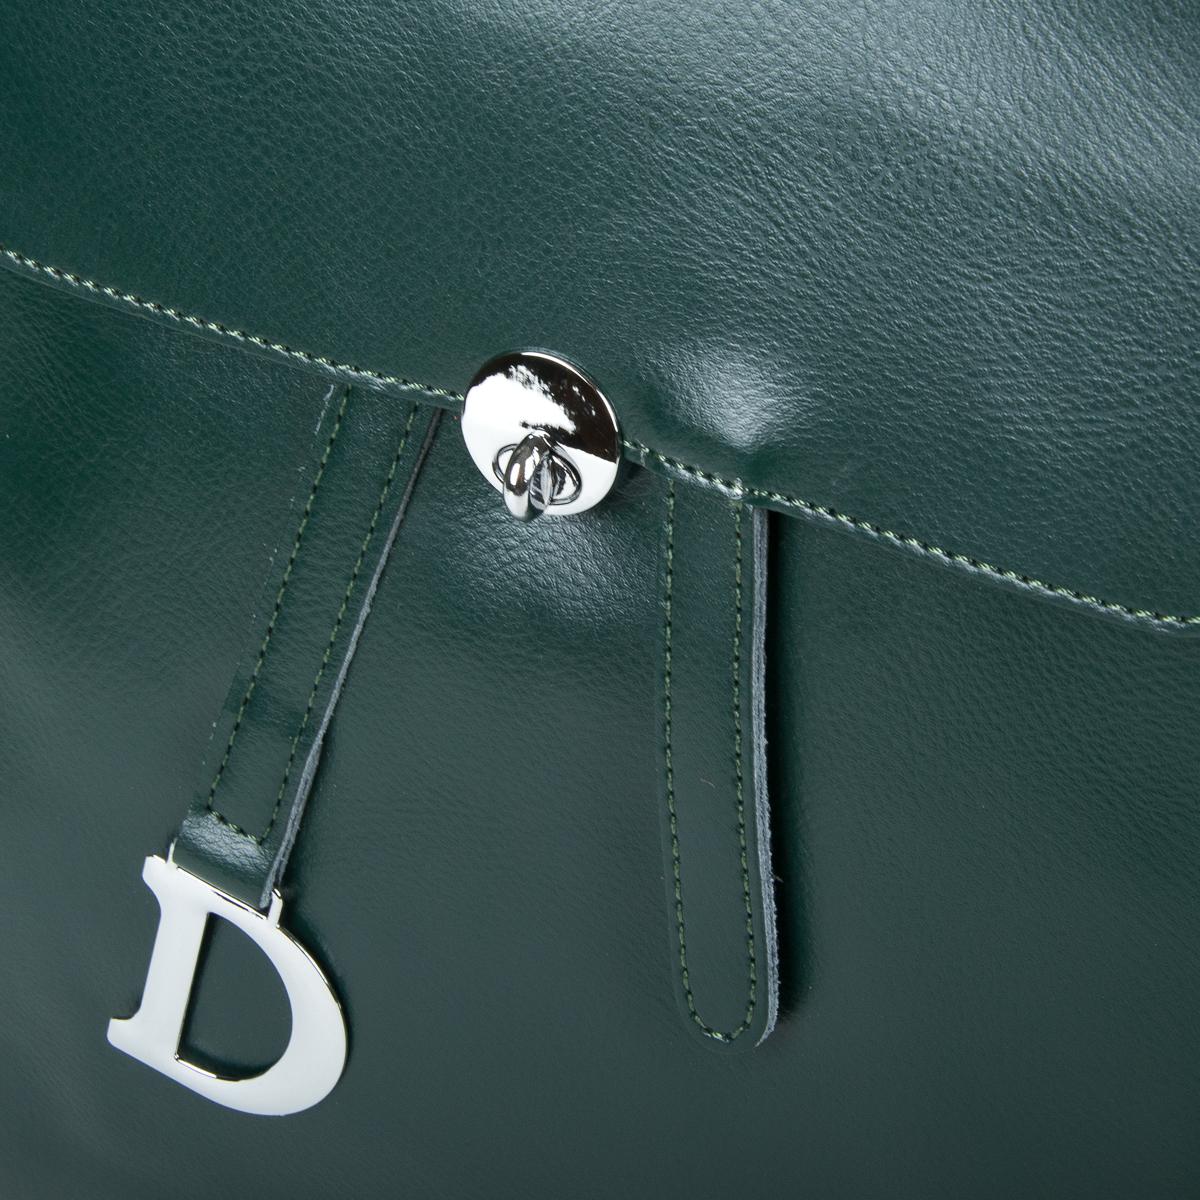 Сумка Женская Рюкзак кожа ALEX RAI 9-01 360 green - фото 3